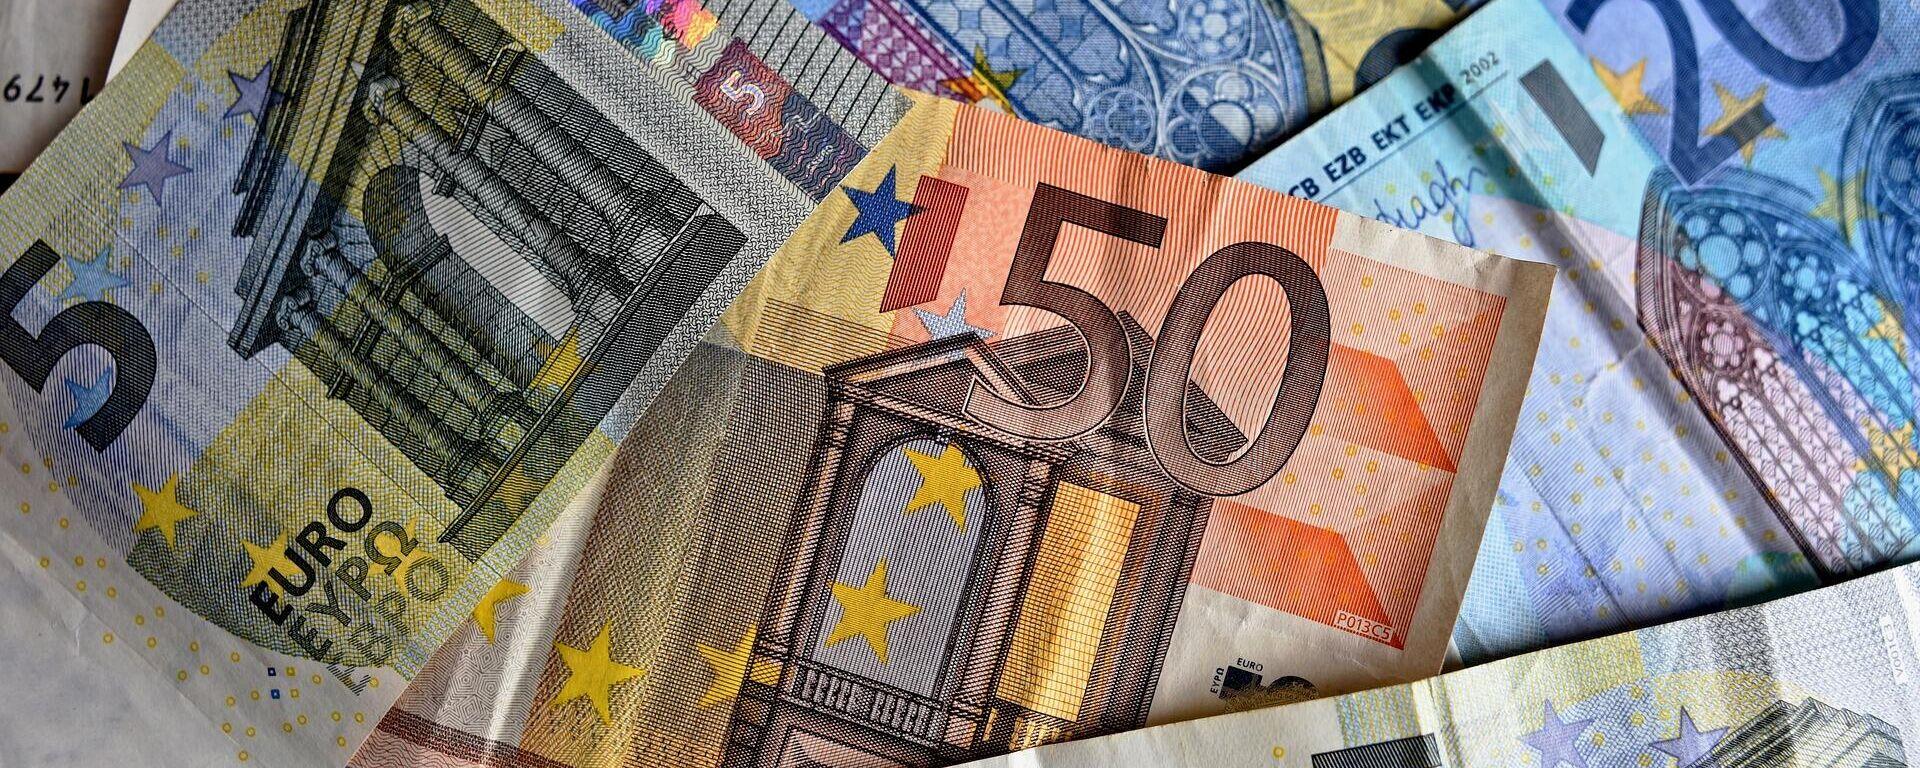 Euro (Symbolbild) - SNA, 1920, 27.05.2021